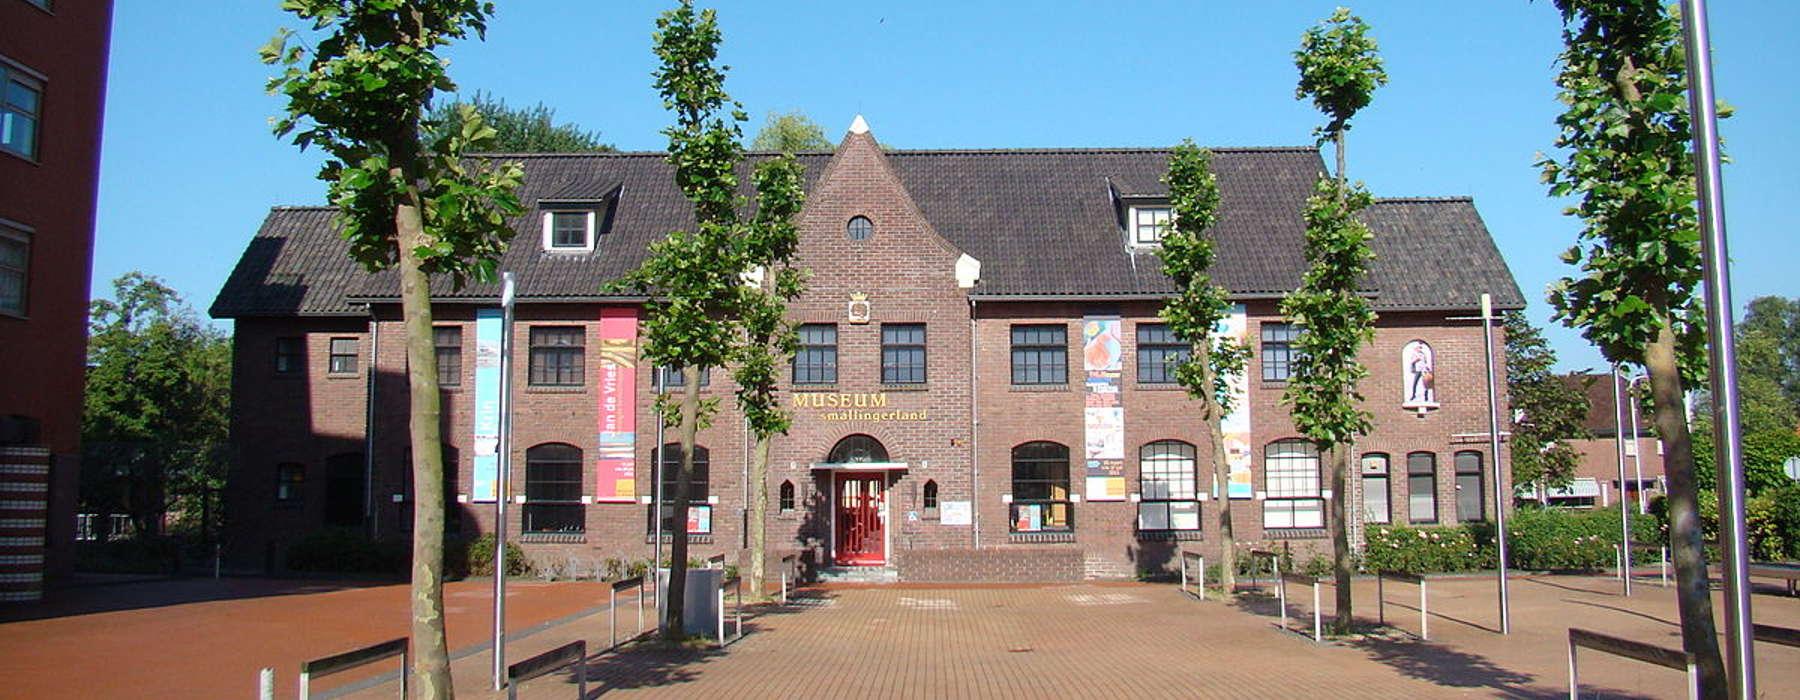 Nijs Gemeente Smellingerlan - Museum